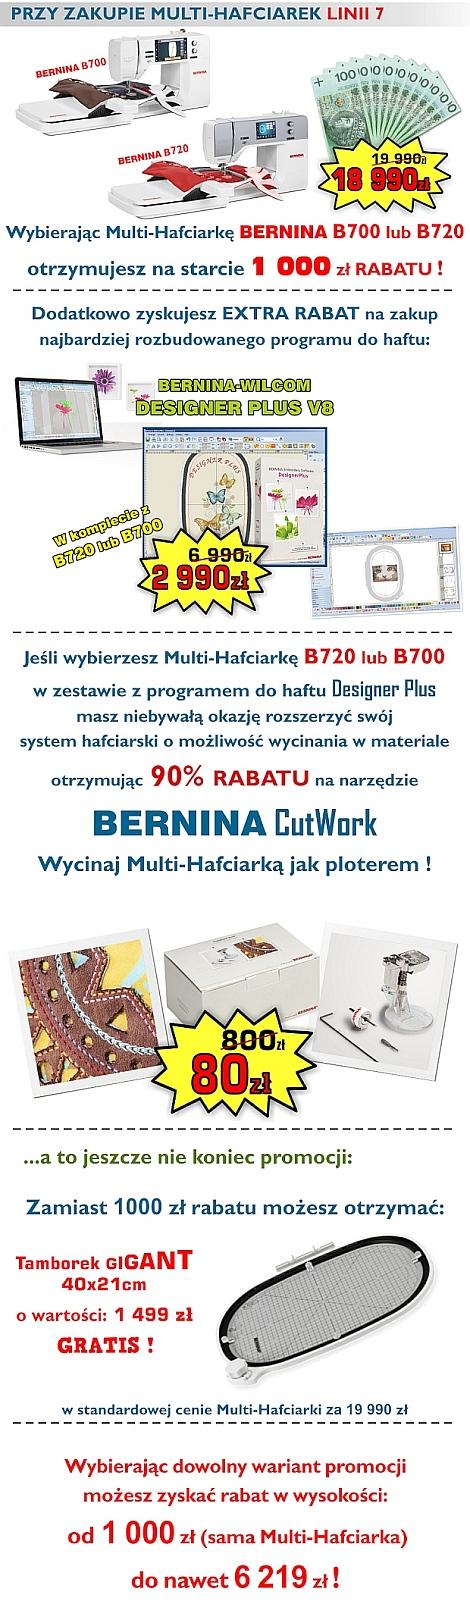 Multi-Hafciarki BERNINA - PROMOCJE !